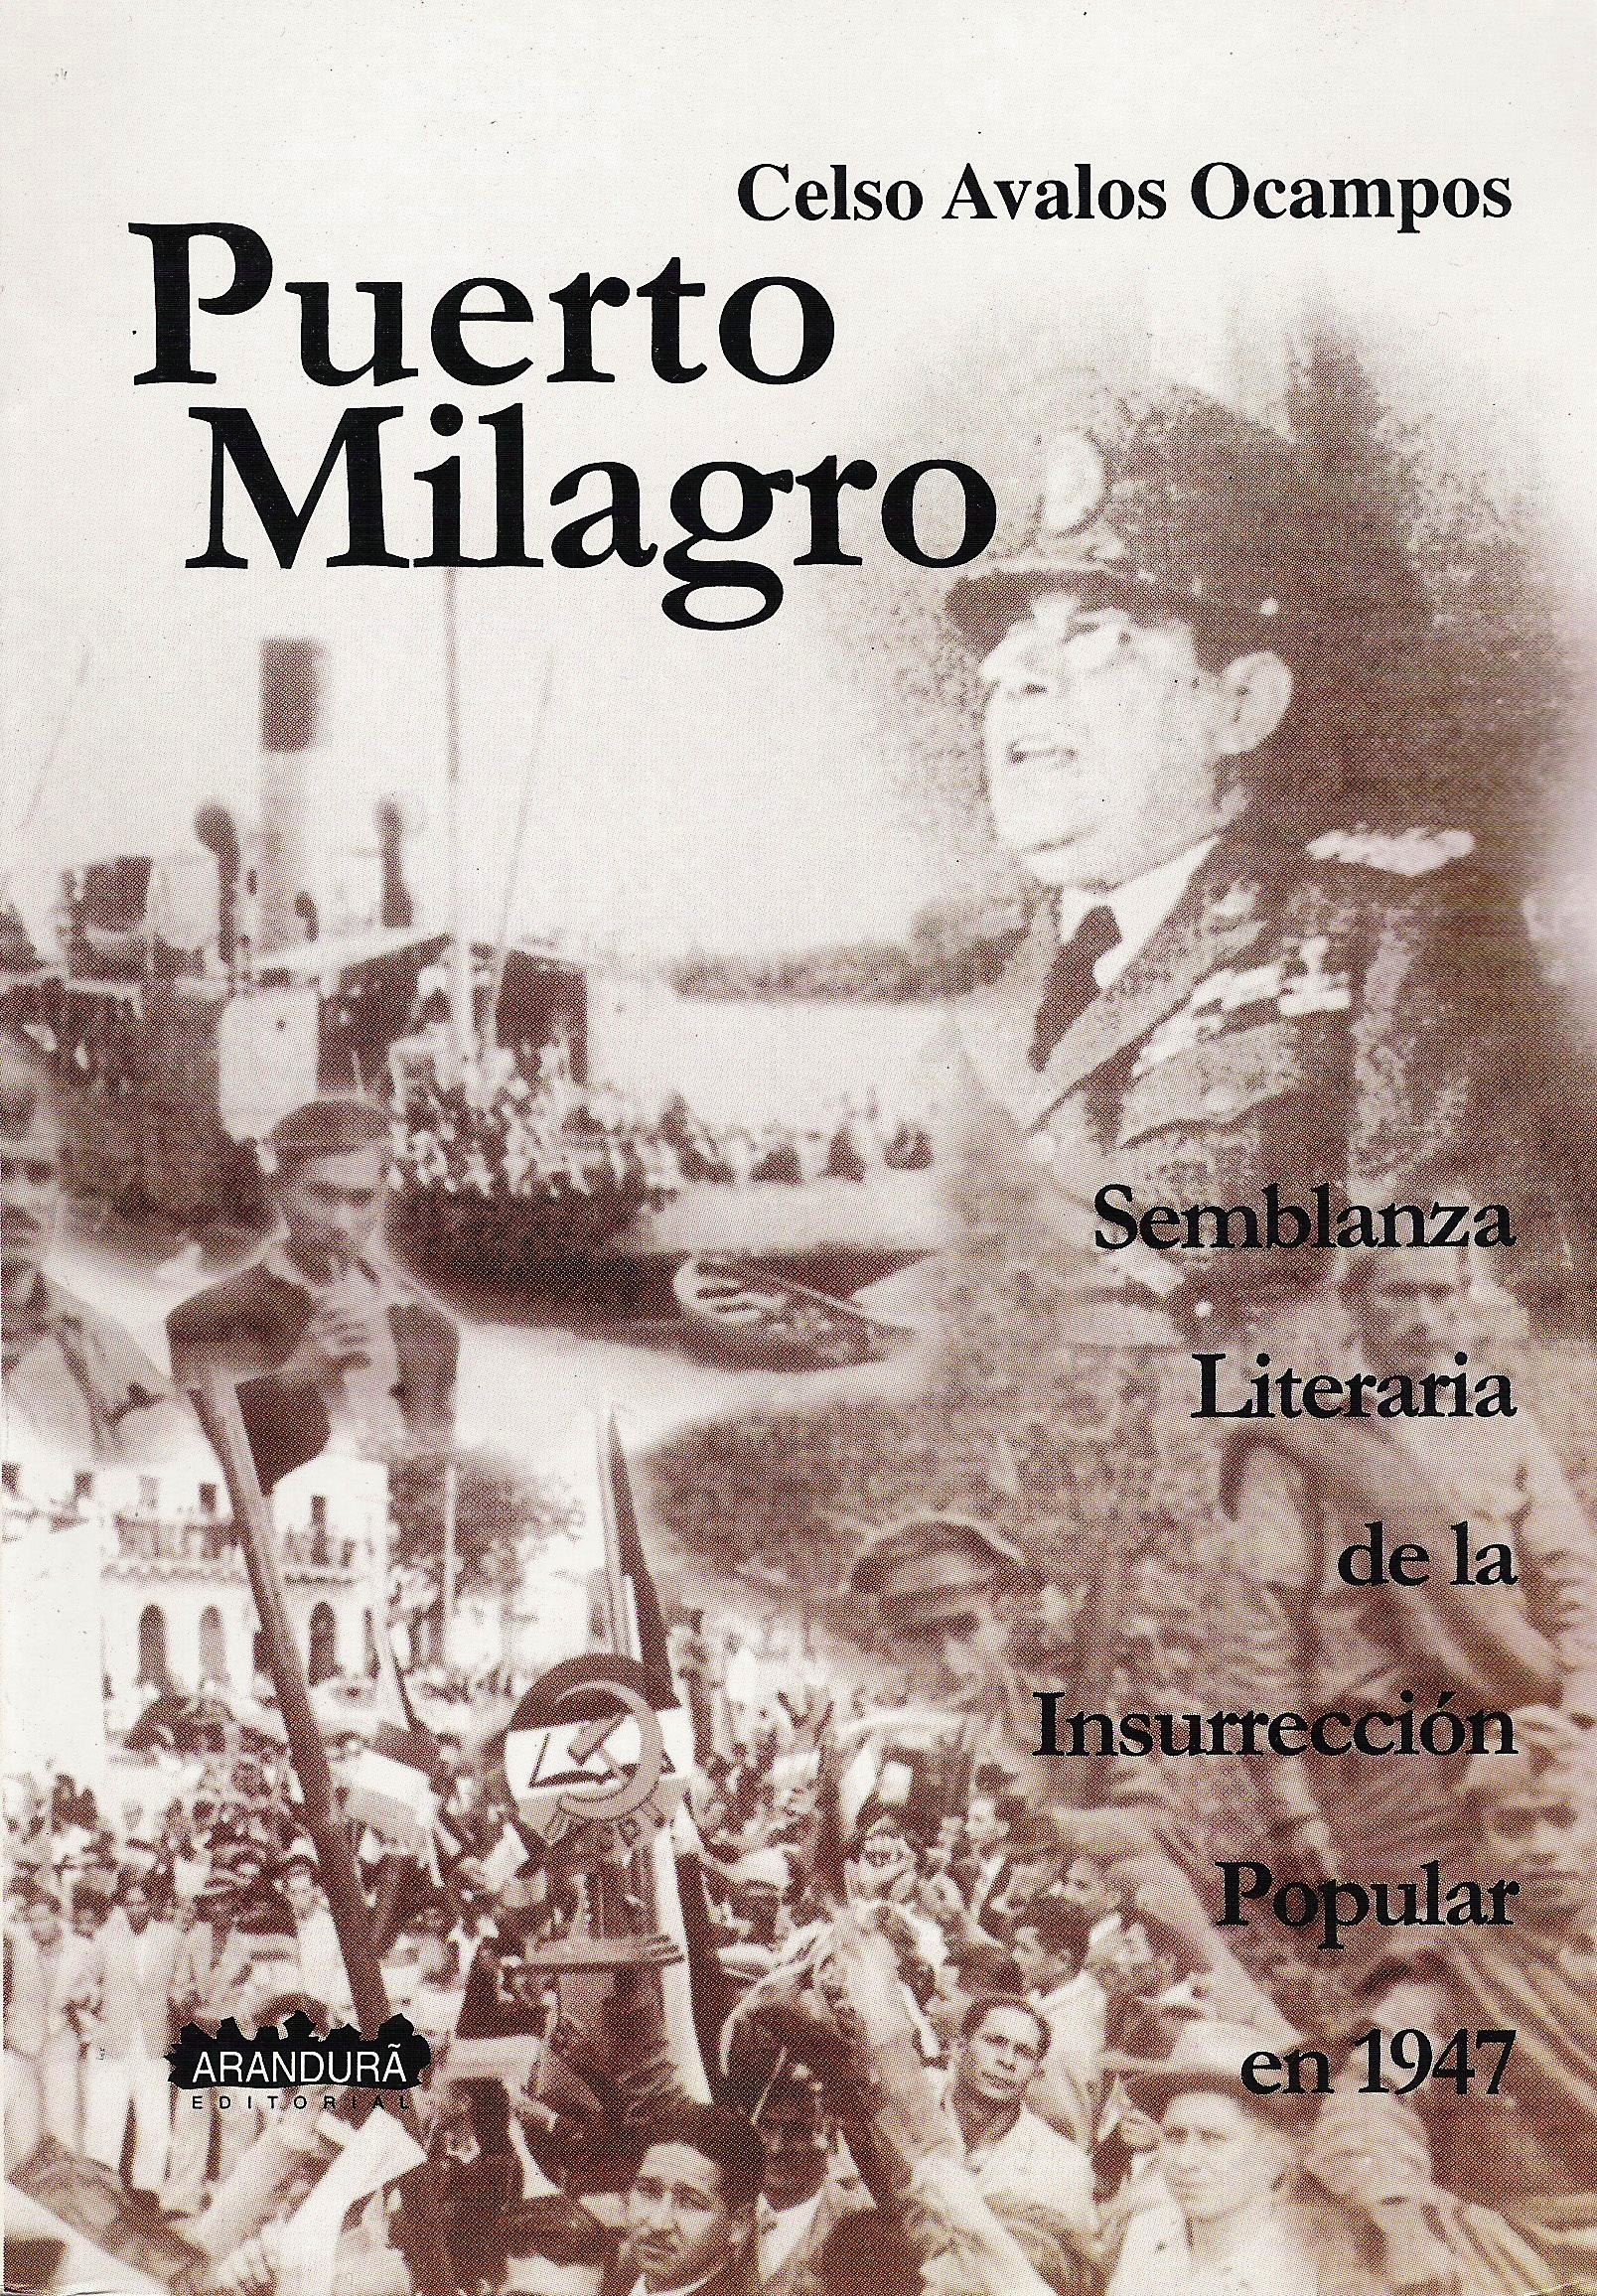 PuertoMilagro_AvalosOcampos